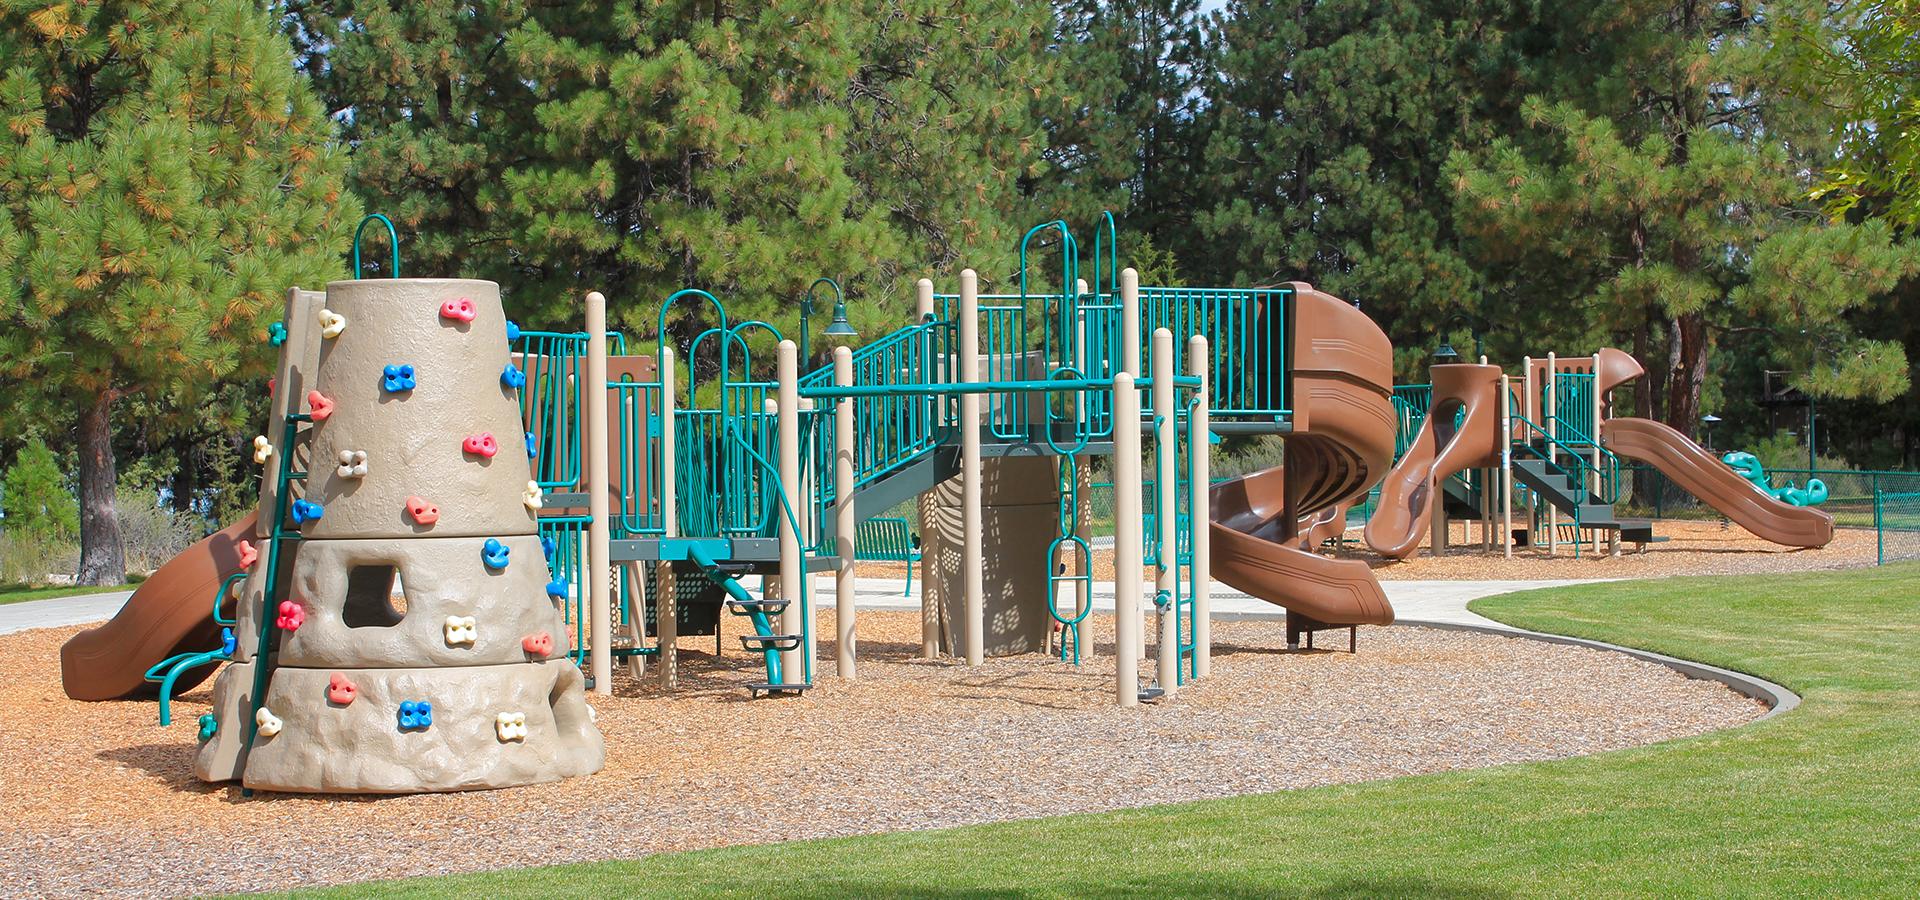 WIldflower-Park-Playground-2